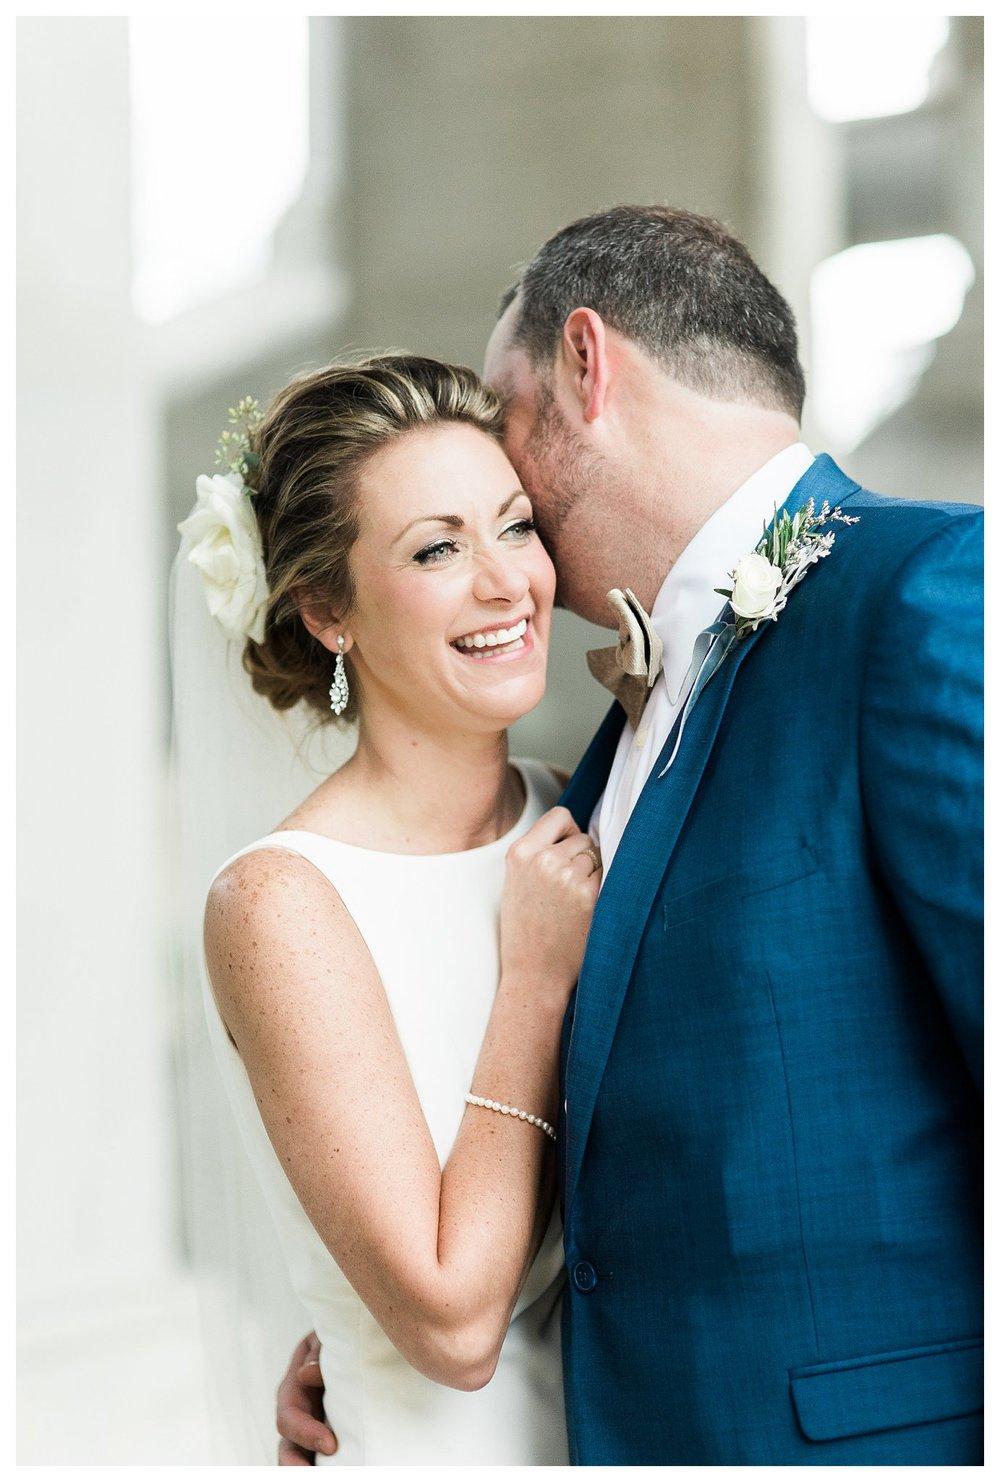 everleigh-photography-cincinnati-wedding-photographer-monastery-event-center-kentucky-wedding-photographer-31